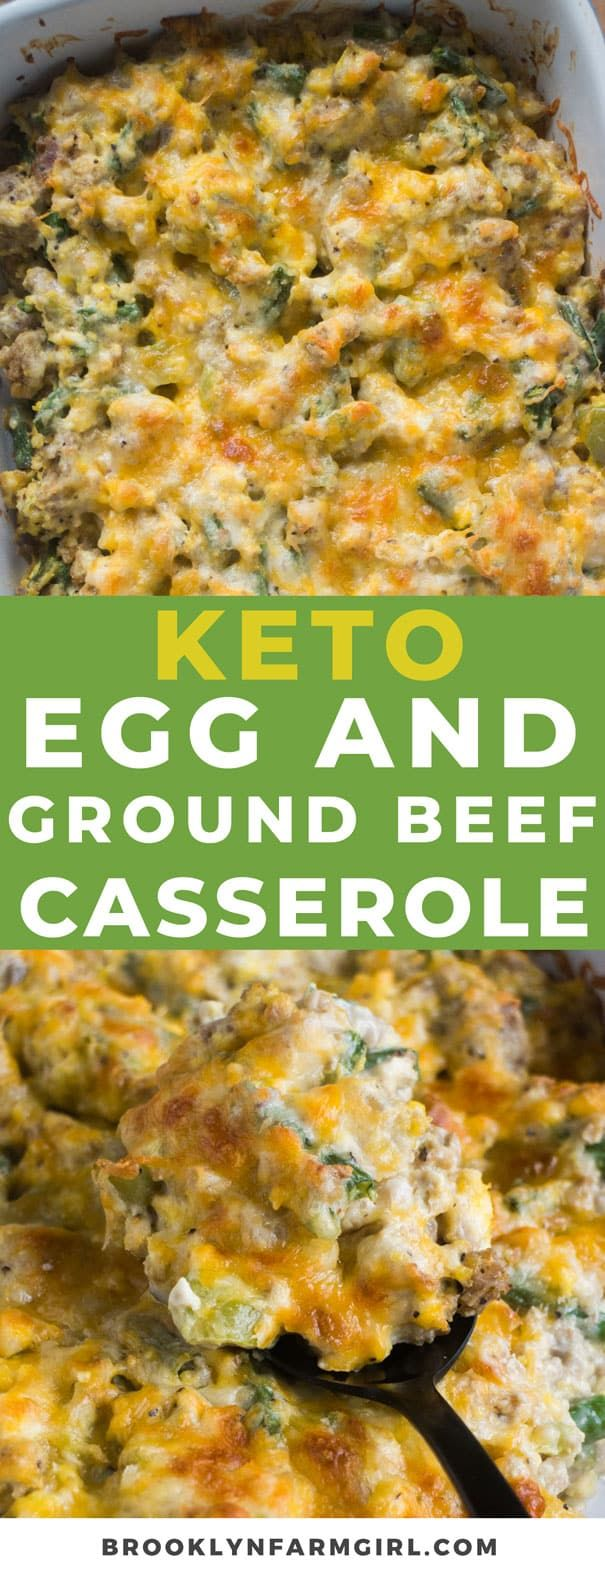 Scrambled Egg Ground Beef Casserole Keto And Low Carb Recipe In 2020 Beef Casserole Recipes Ground Beef Casserole Recipes Casserole Recipes